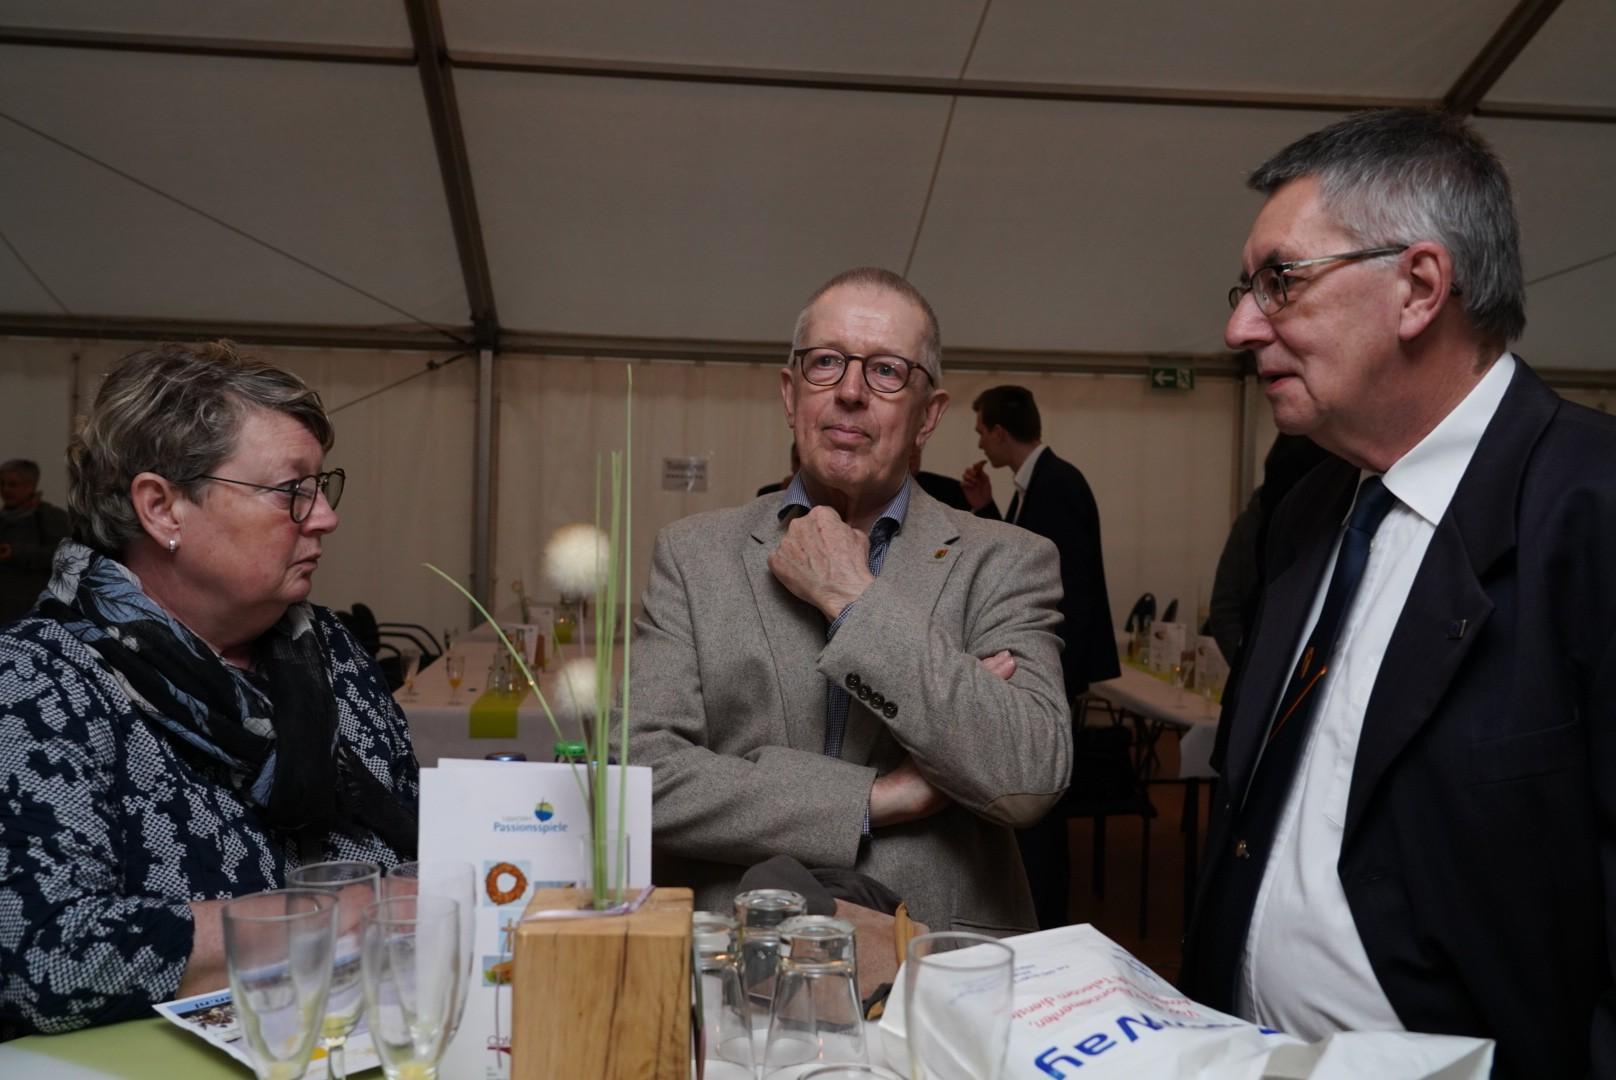 Vertreter der EuroPassion, u.a. Lex Houba